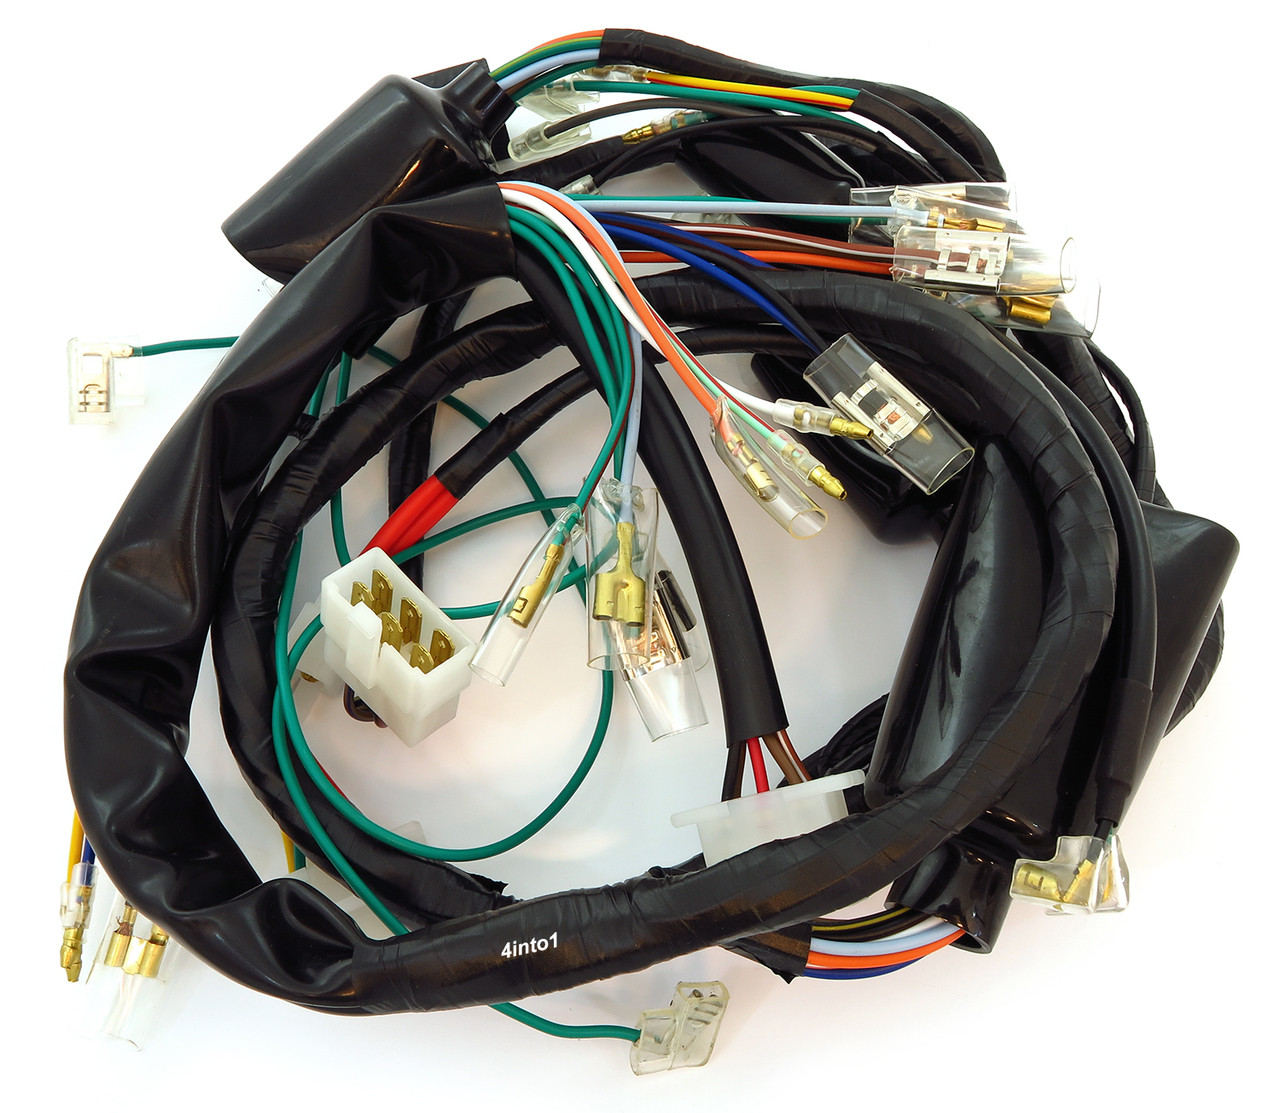 Cb400f Wiring Harness Library Diagram Main 32100 377 030 Honda Image 1